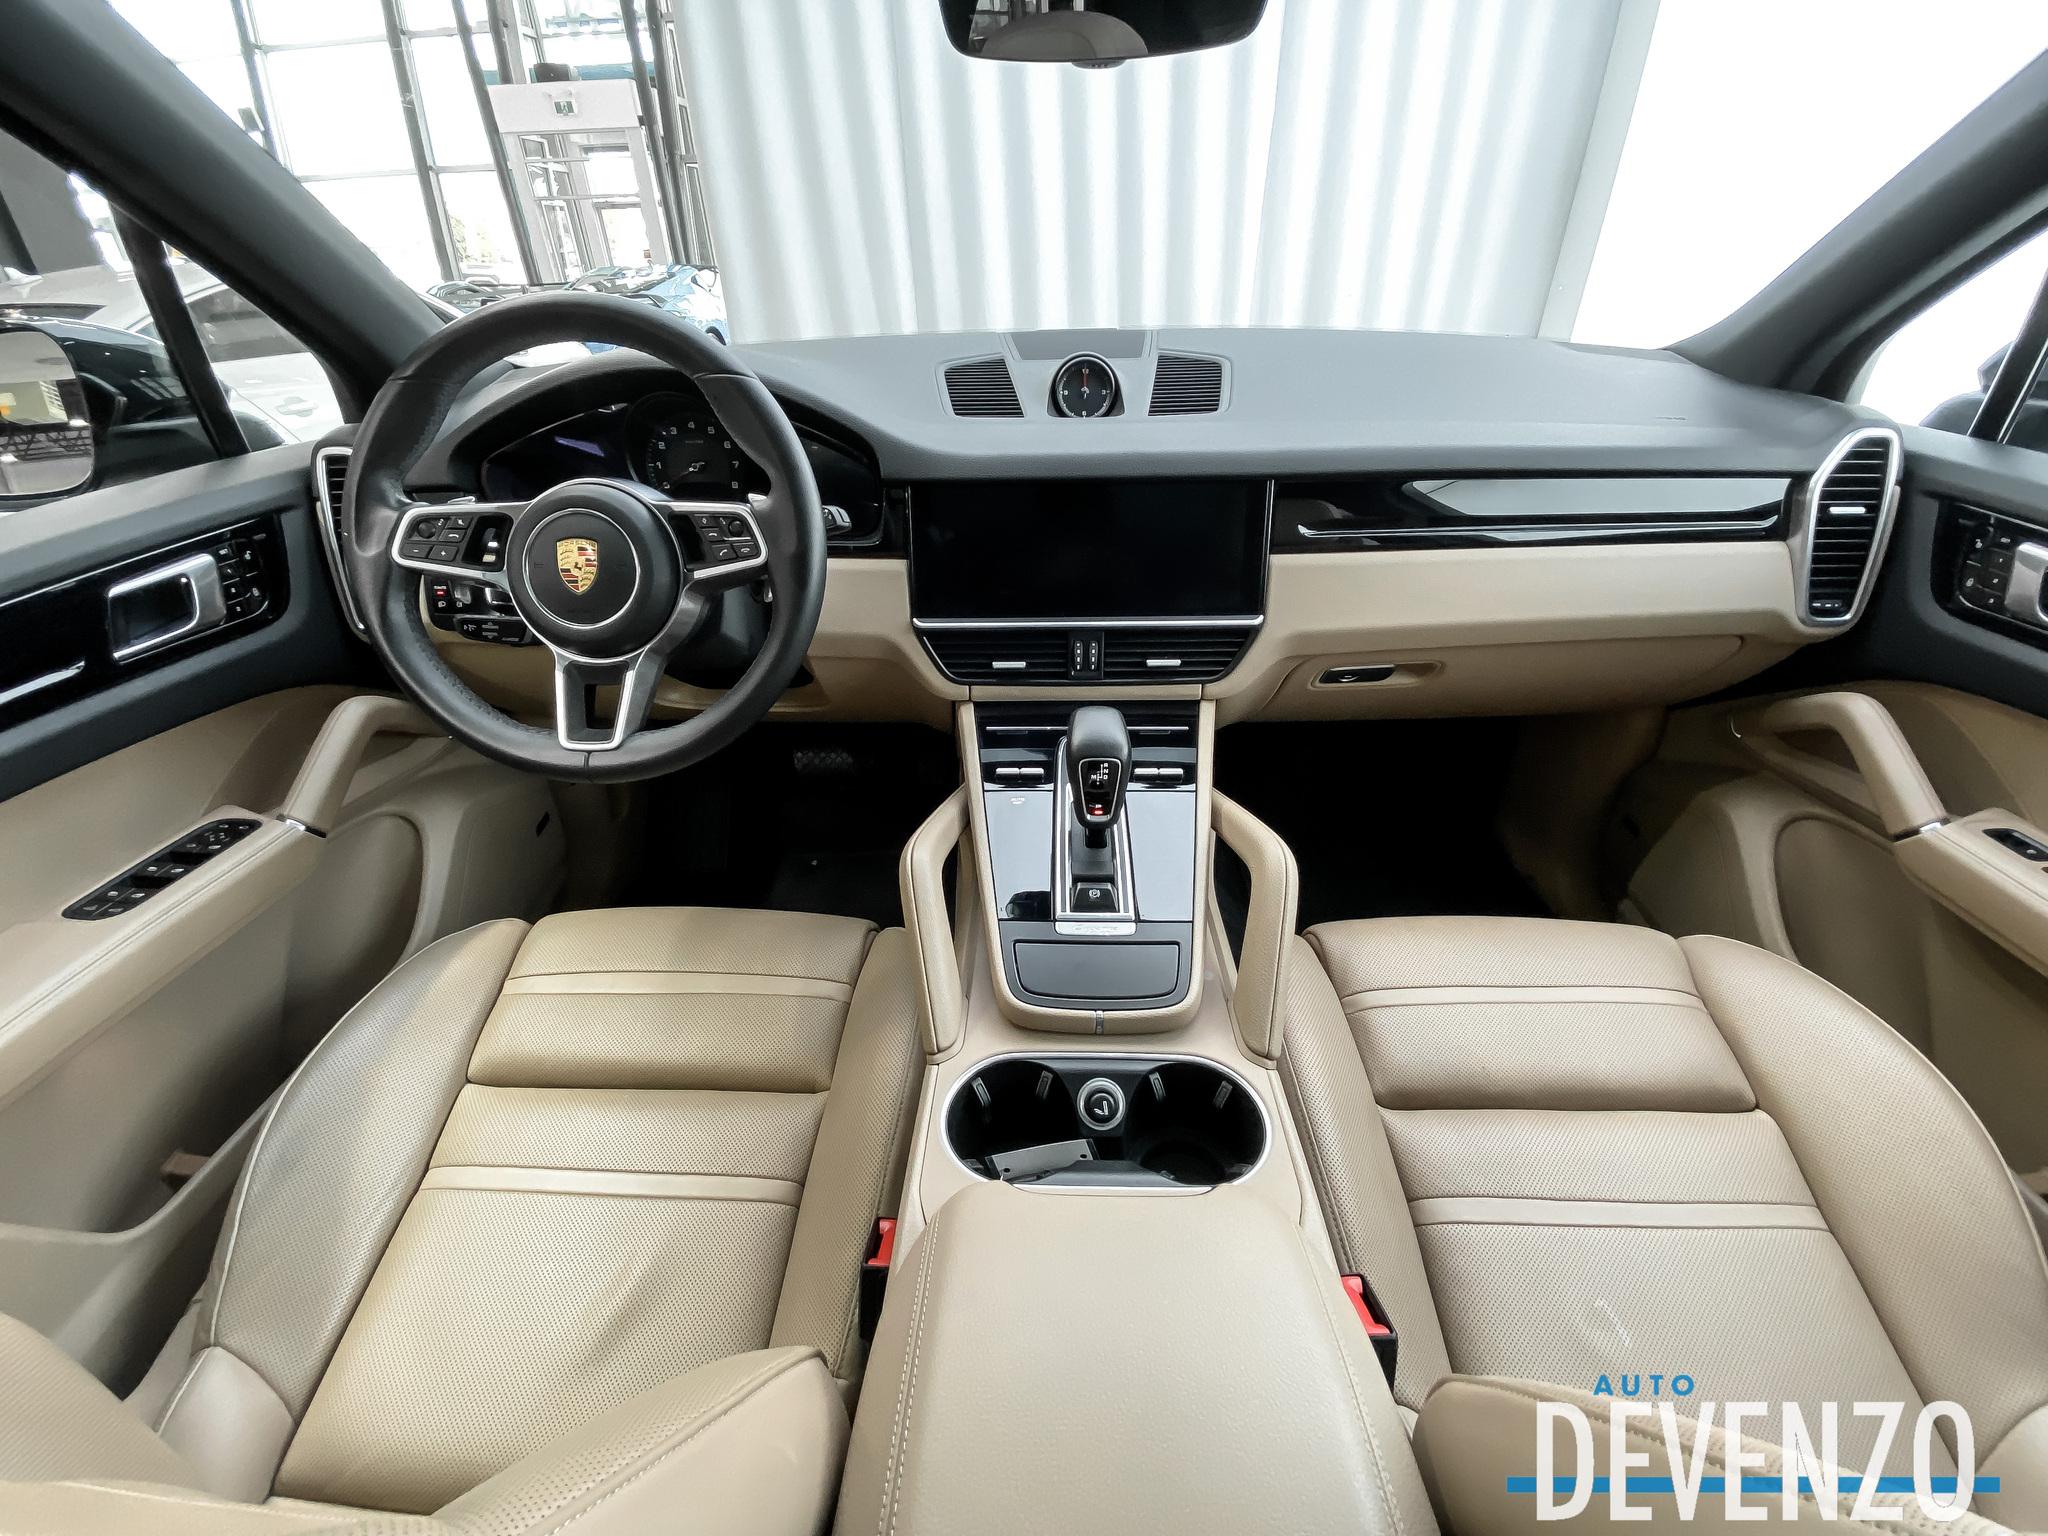 2019 Porsche Cayenne AWD PREMIUM PLUS / ACTIVE SUSPENSION full